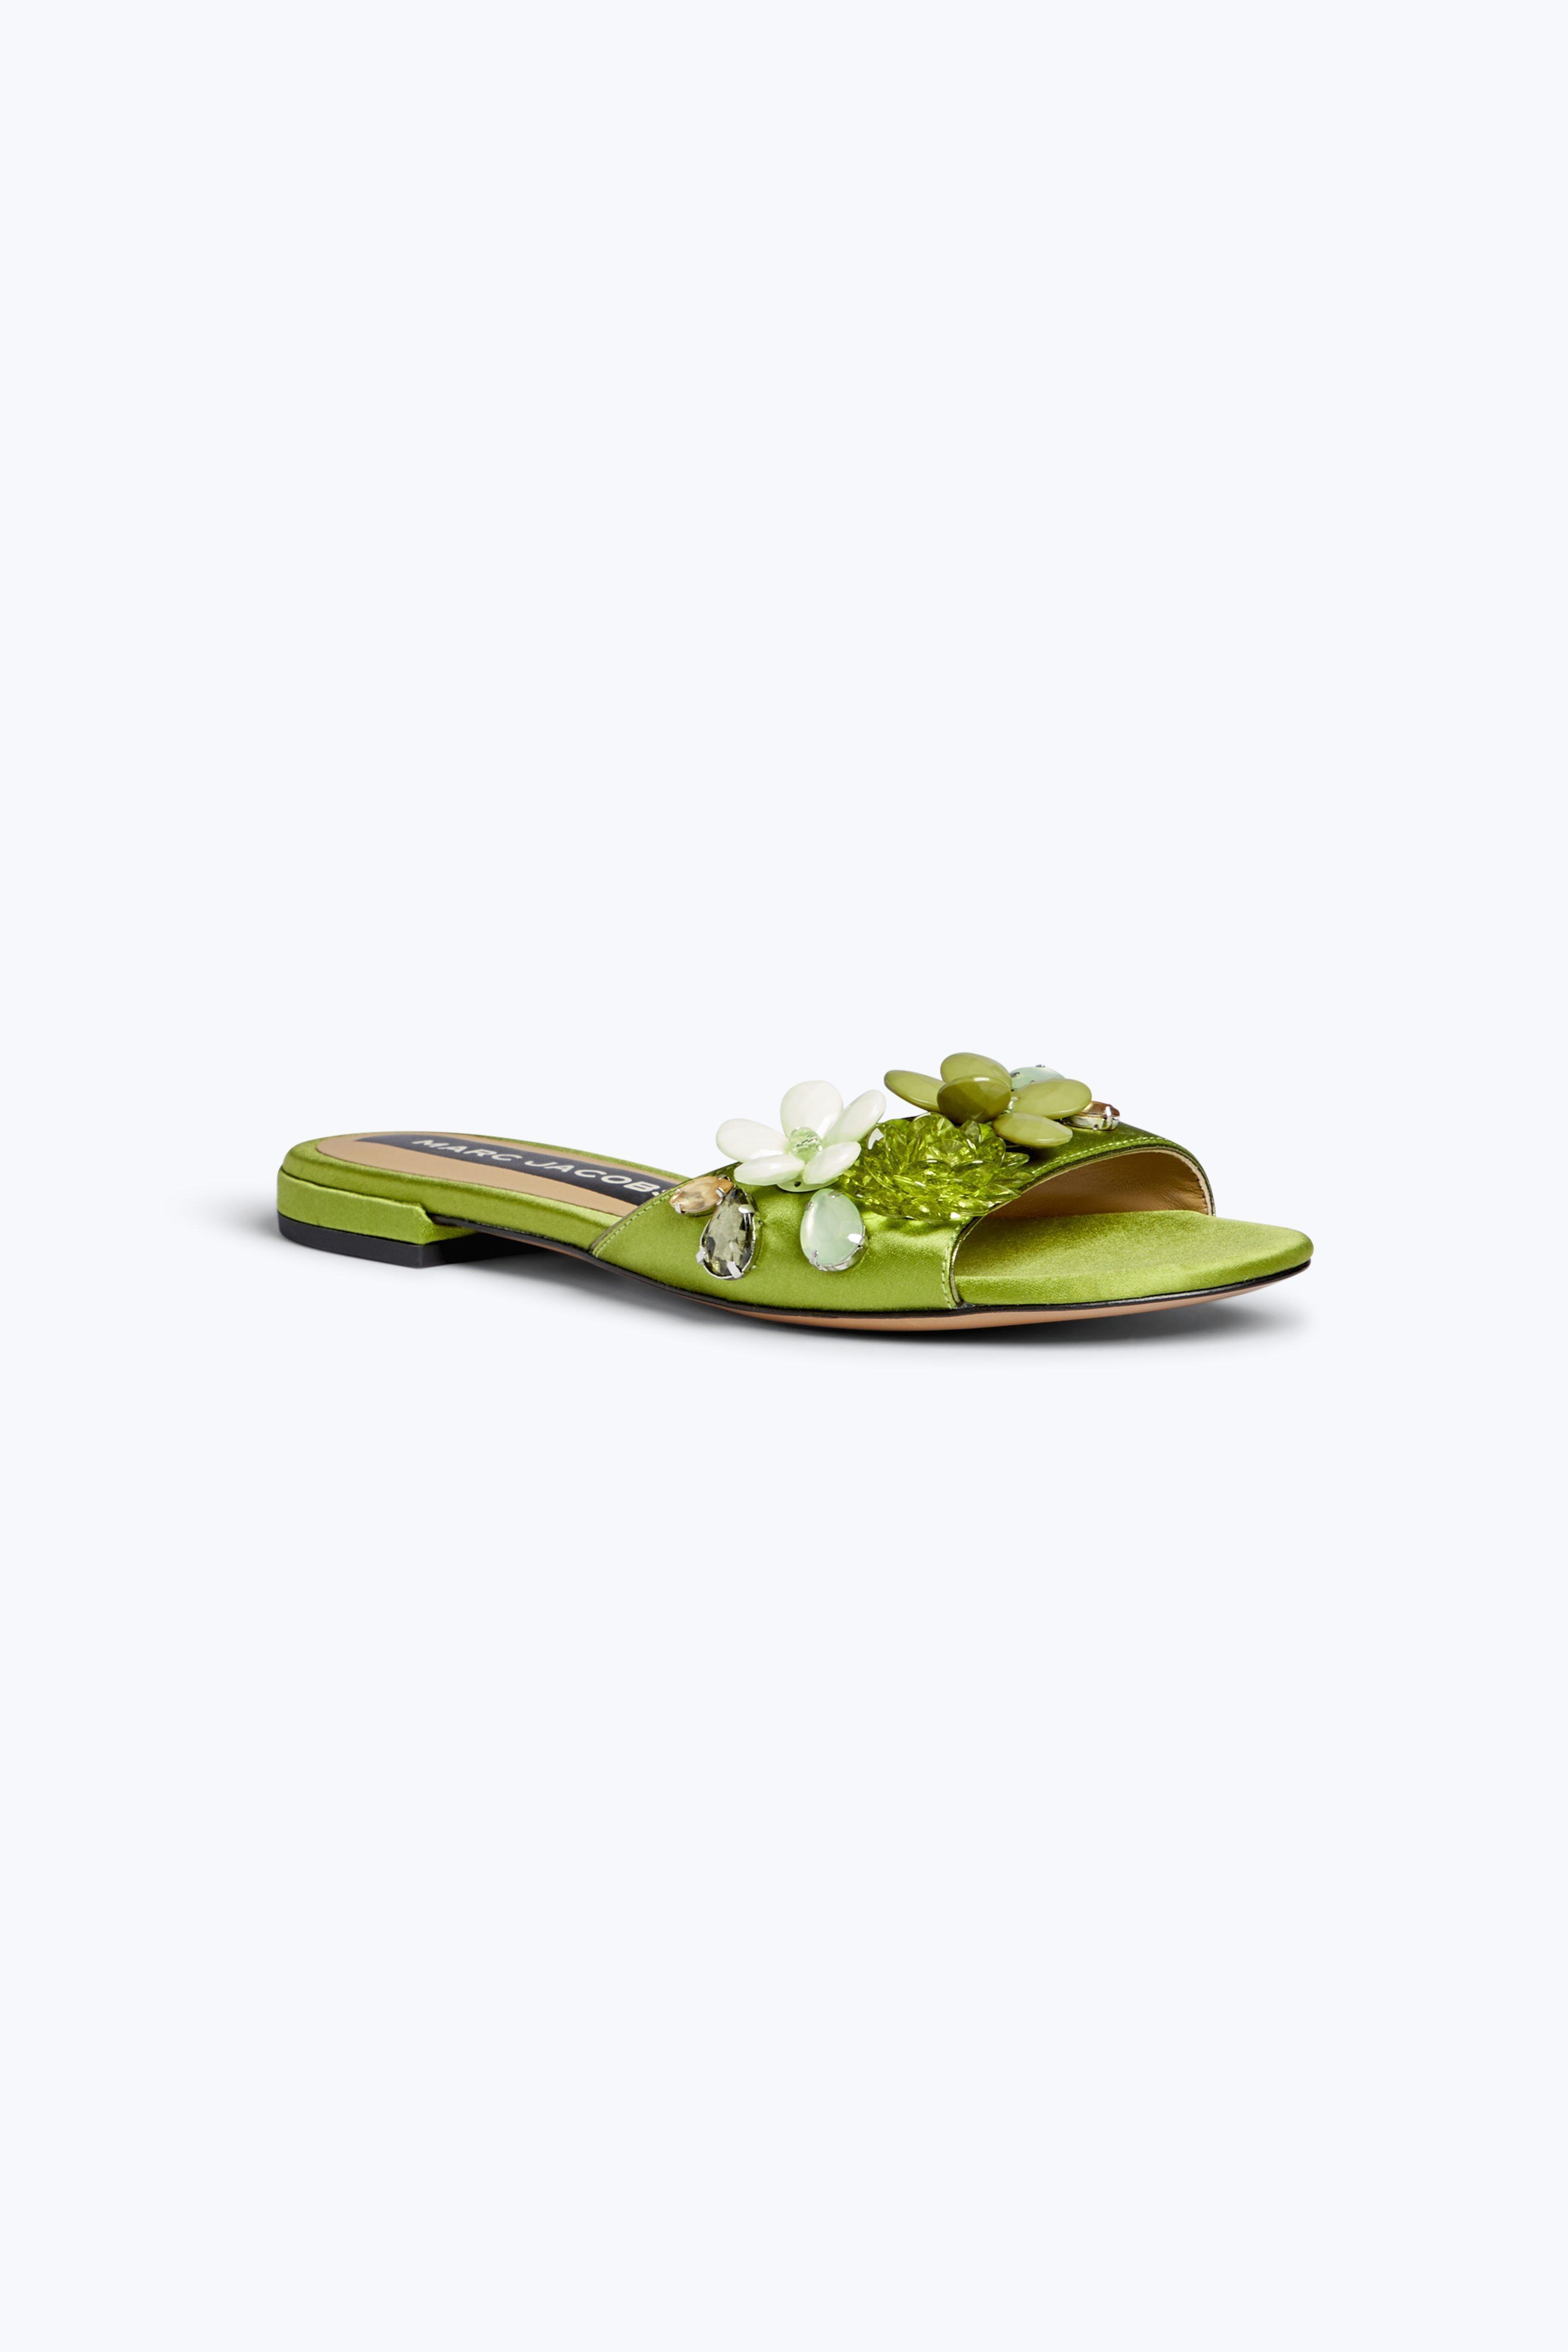 Clara embellished slides - Green Marc Jacobs SZ63HID4X